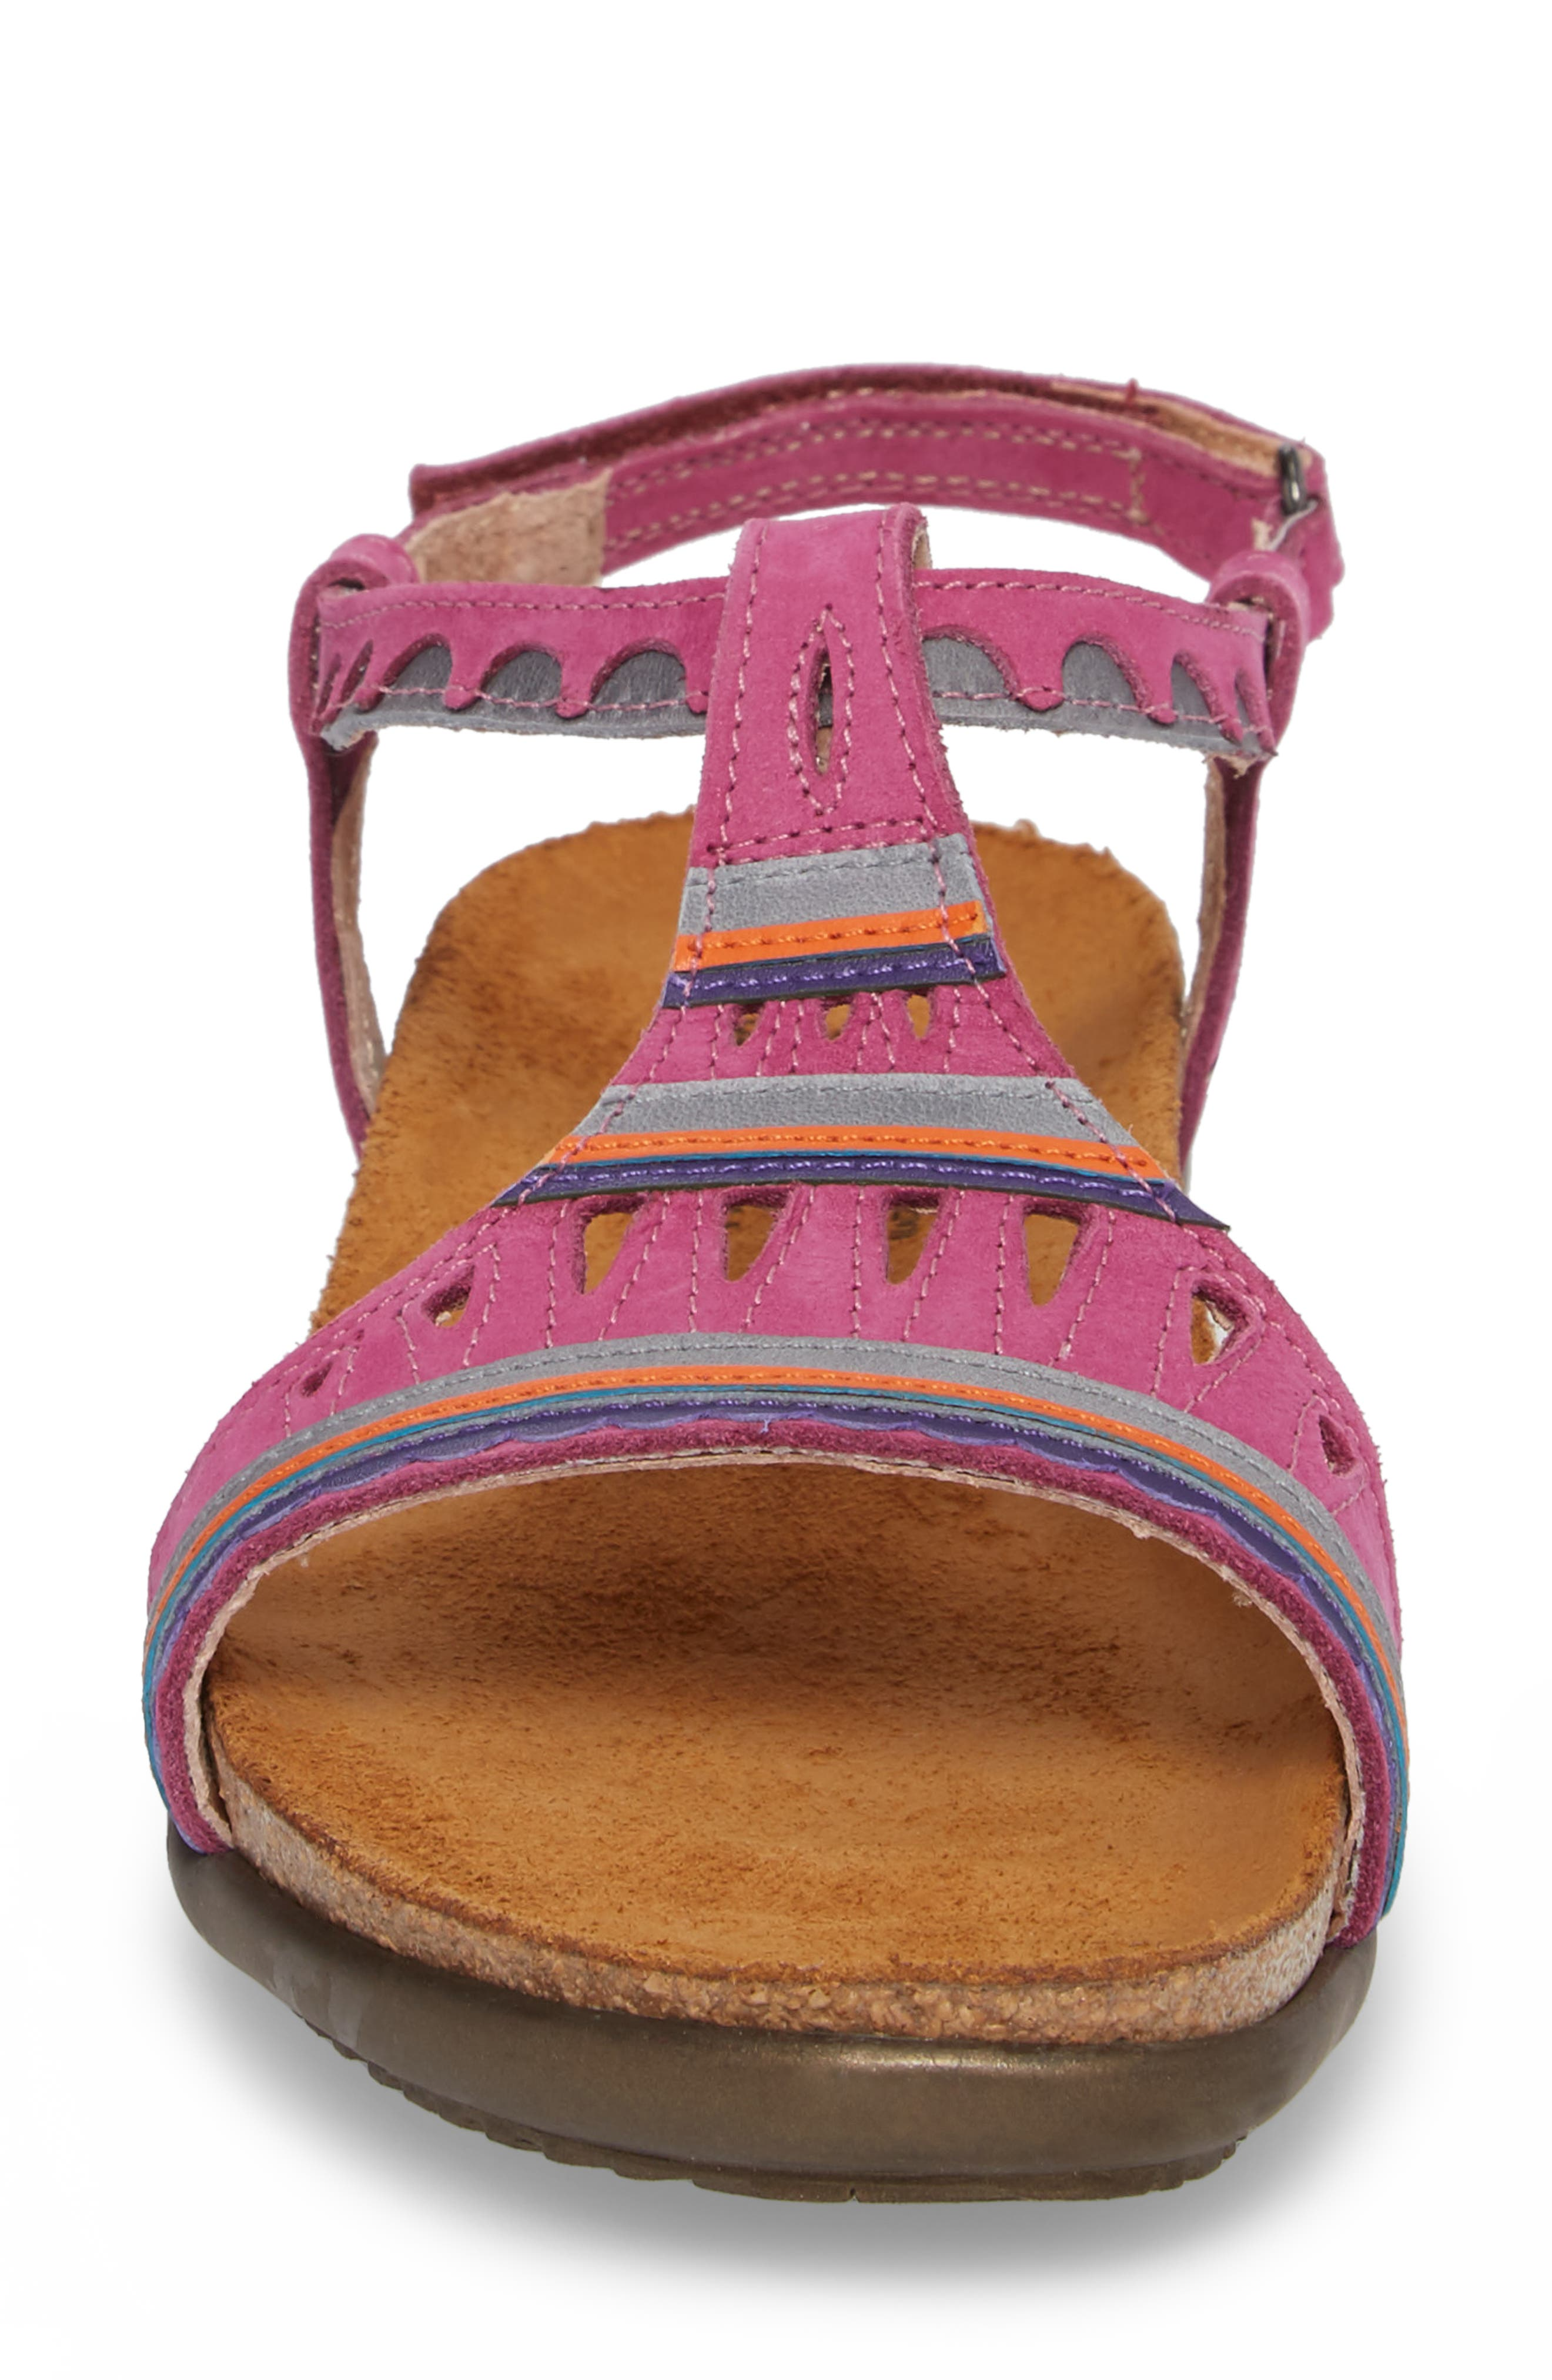 NAOT, Odelia Perforated T-Strap Sandal, Alternate thumbnail 4, color, PINK PLUM NUBUCK